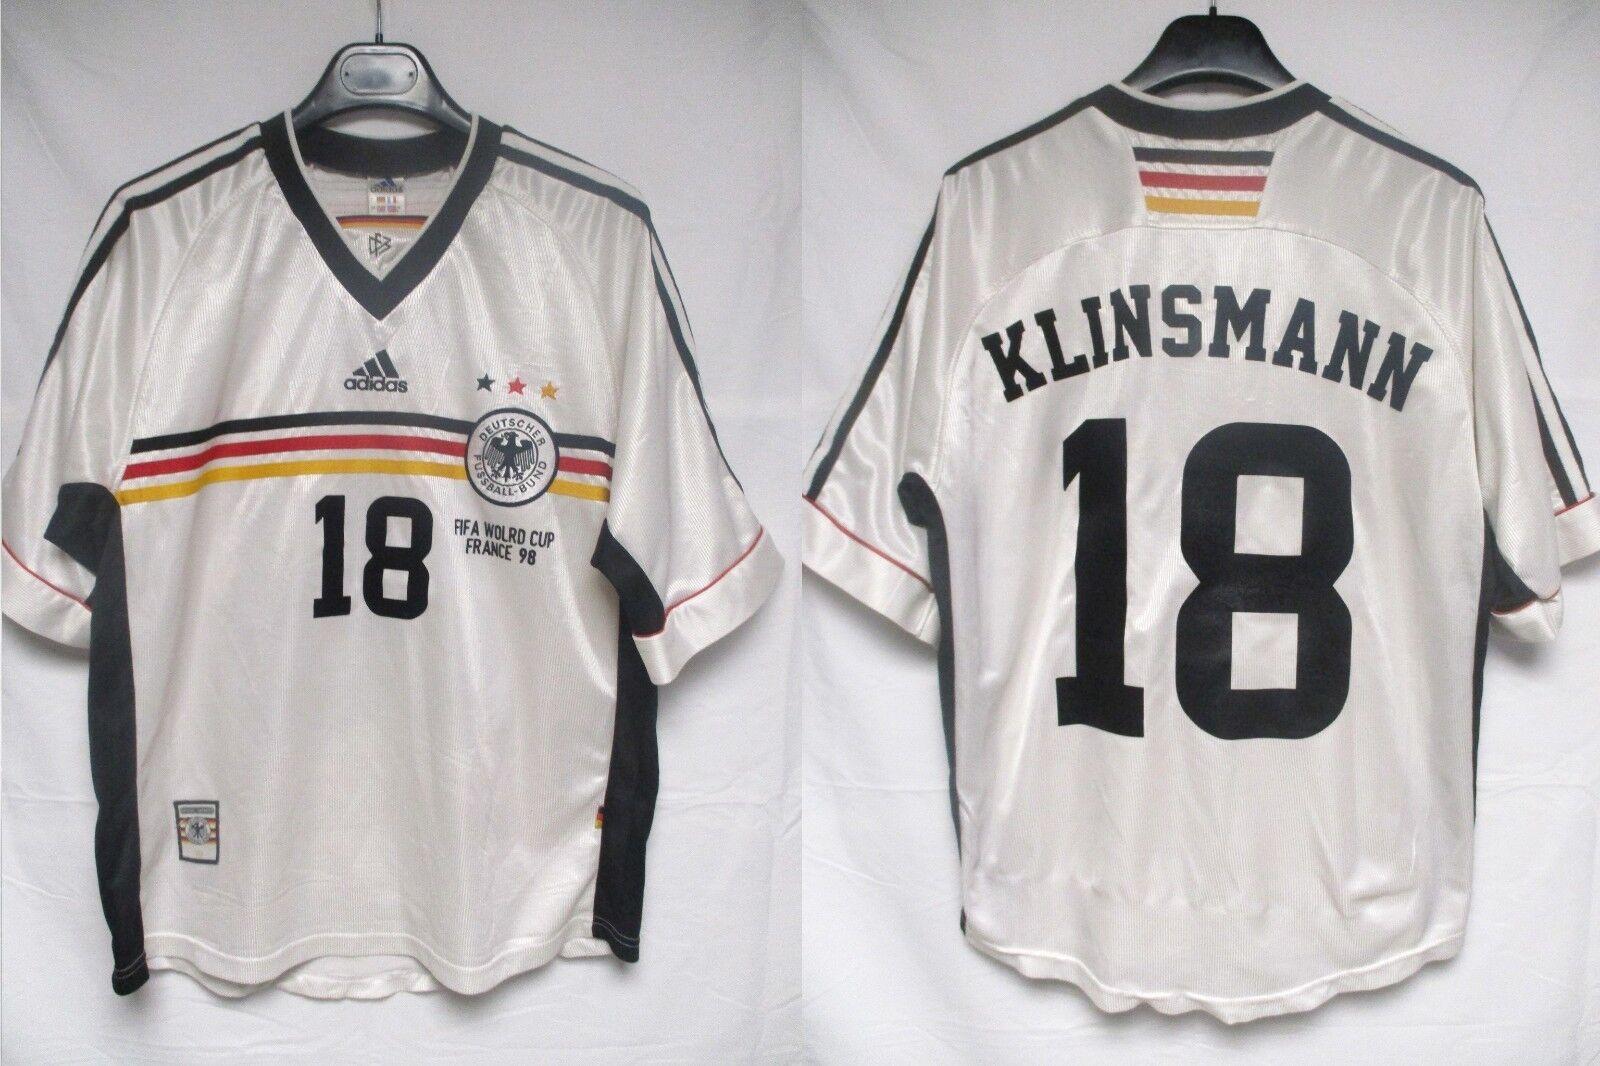 Maillot ALLEMAGNE Adidas trikot DEUTSCHLAND KLINSMANN Germany shirt World Cup 98